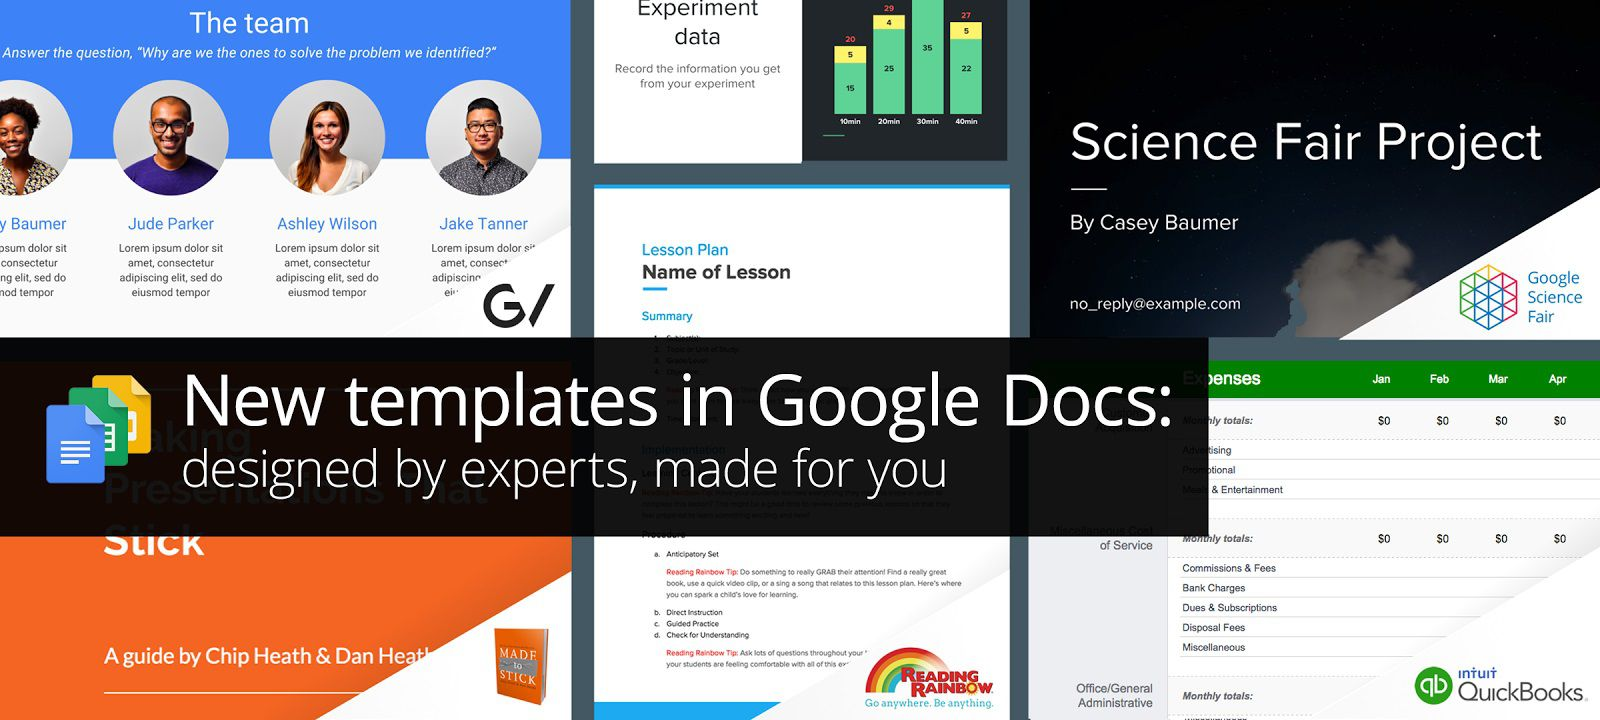 001 Stupendou Free Google Doc Template Image  Templates Drive Slide For Teacher ReportFull